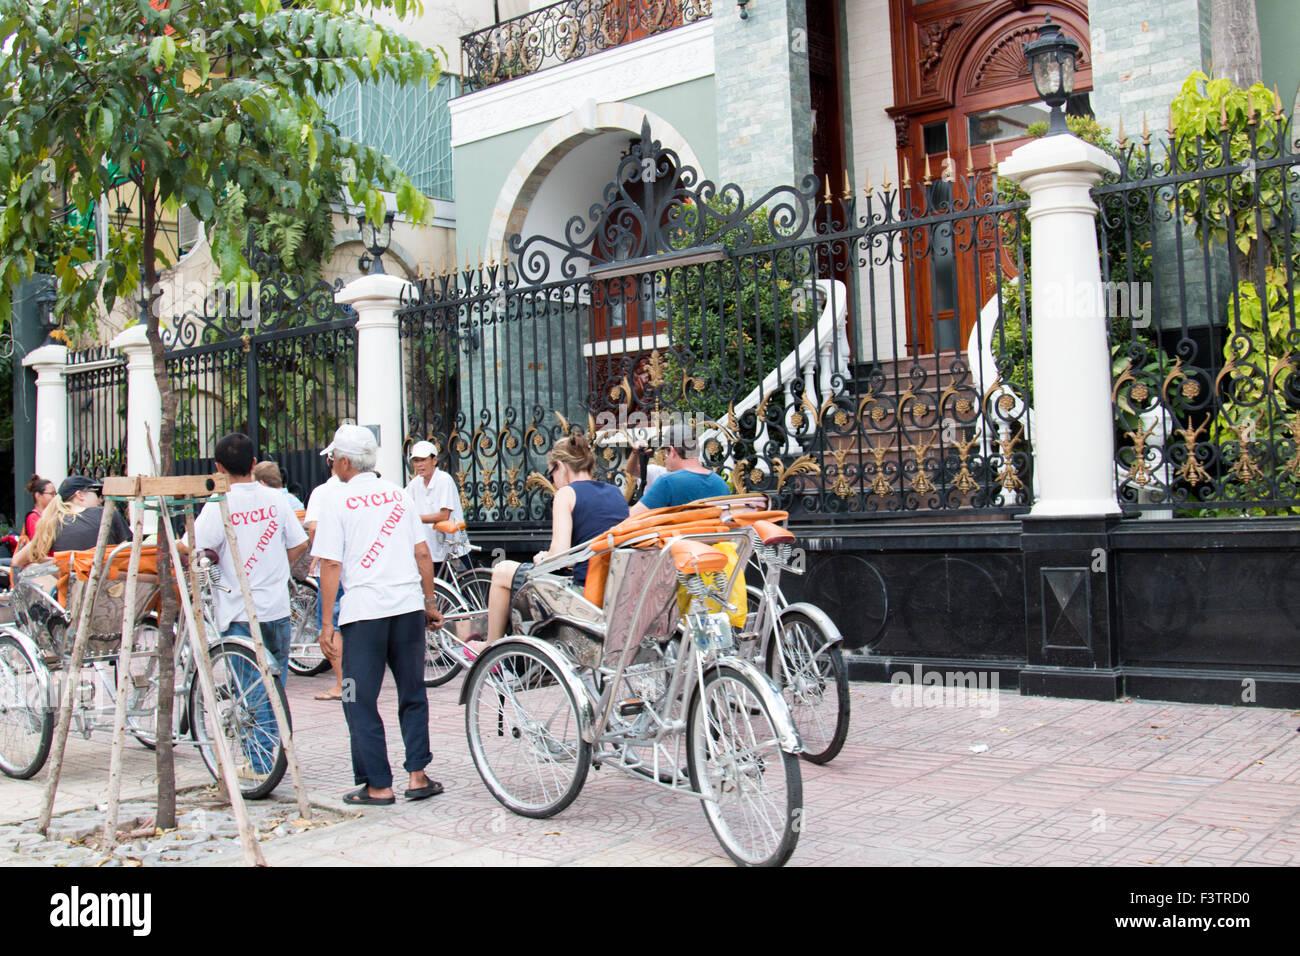 Cyclo transport city tour group in Ho Chi Minh Saigon,Vietnam,Asia - Stock Image